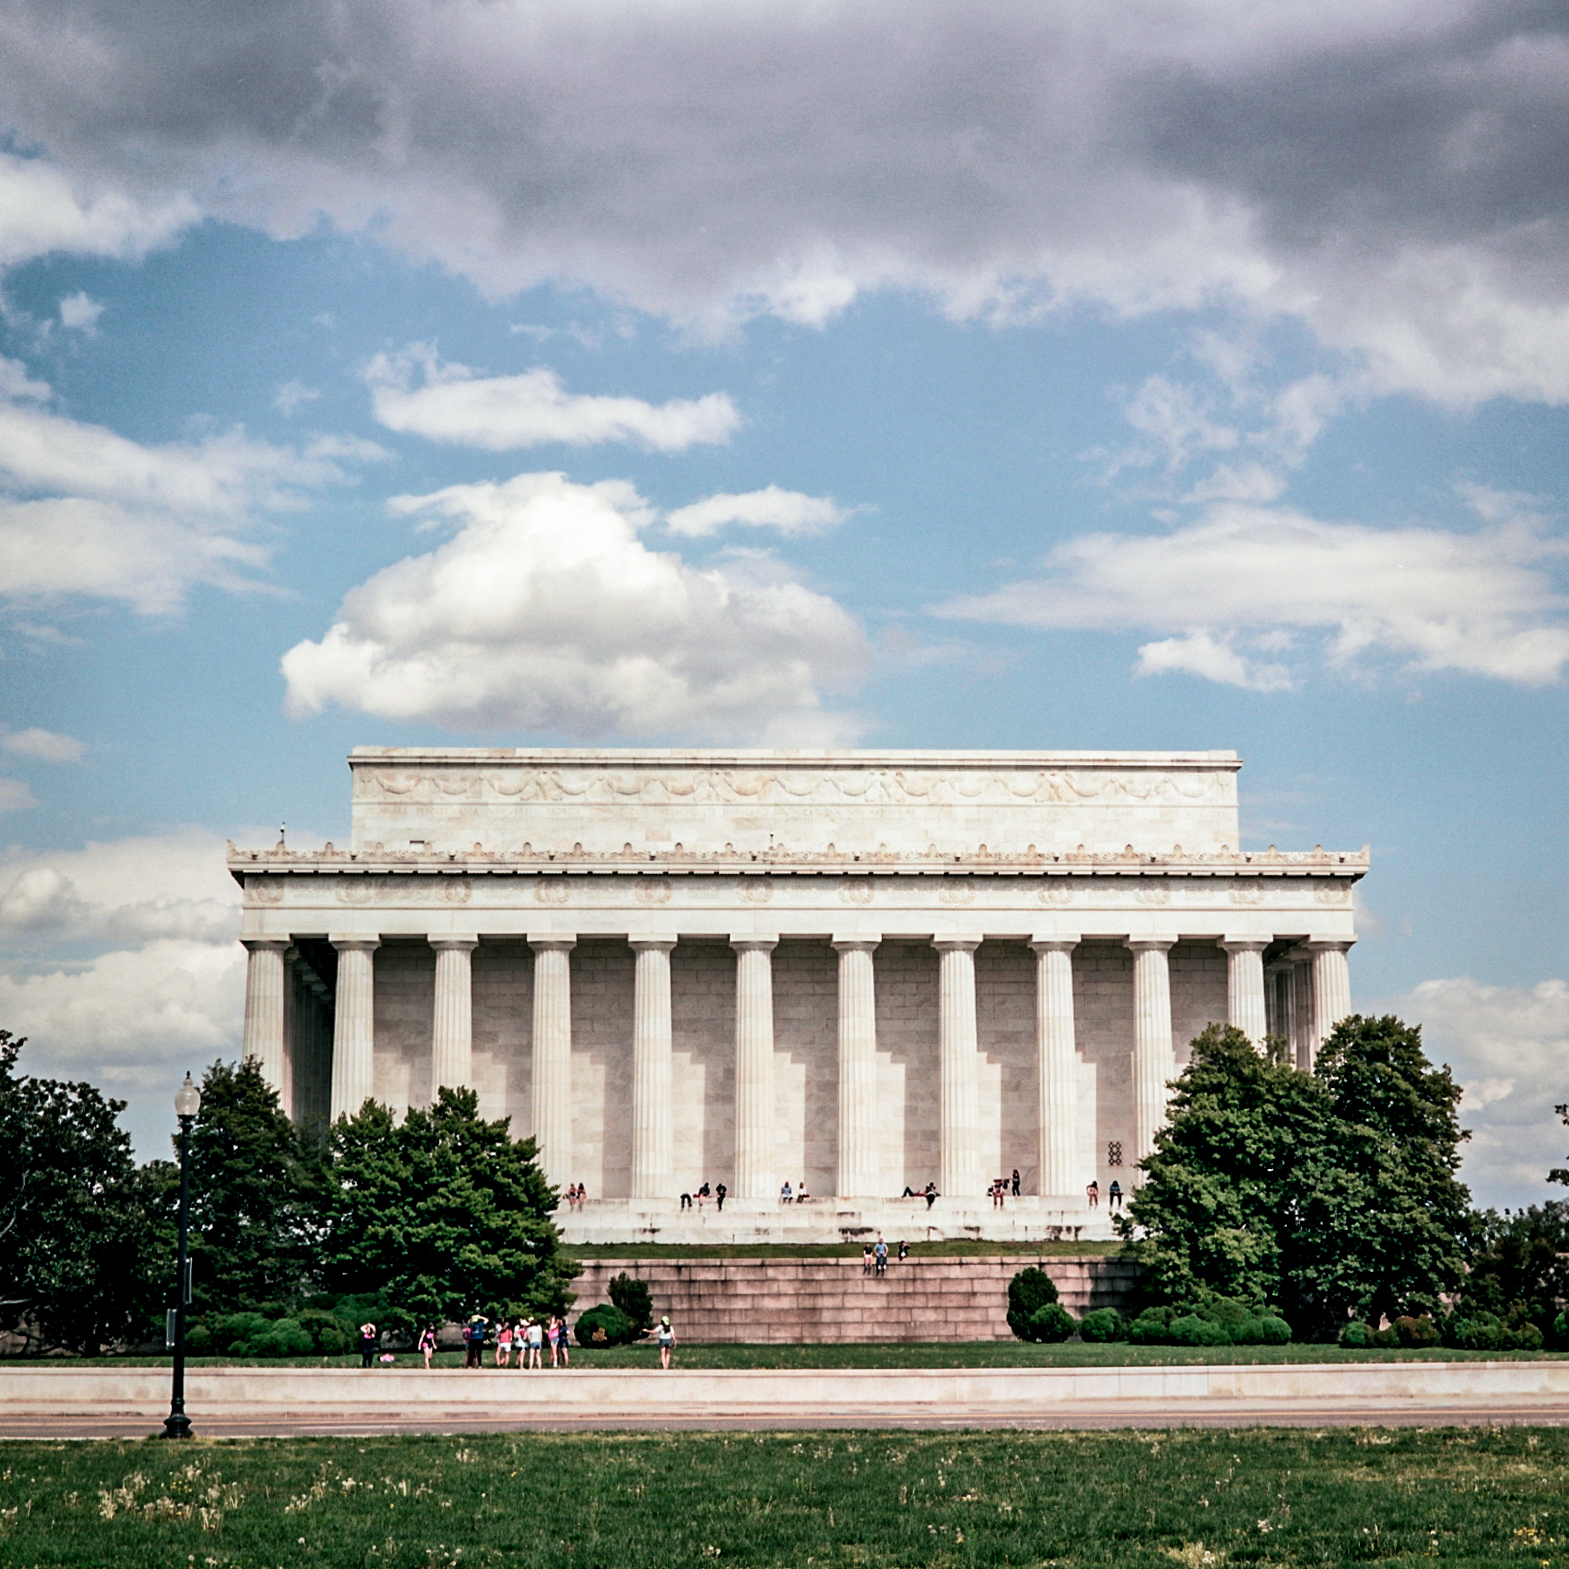 Lincoln - Washington D.C. 2014 - Fuji 6x7 Portra 160